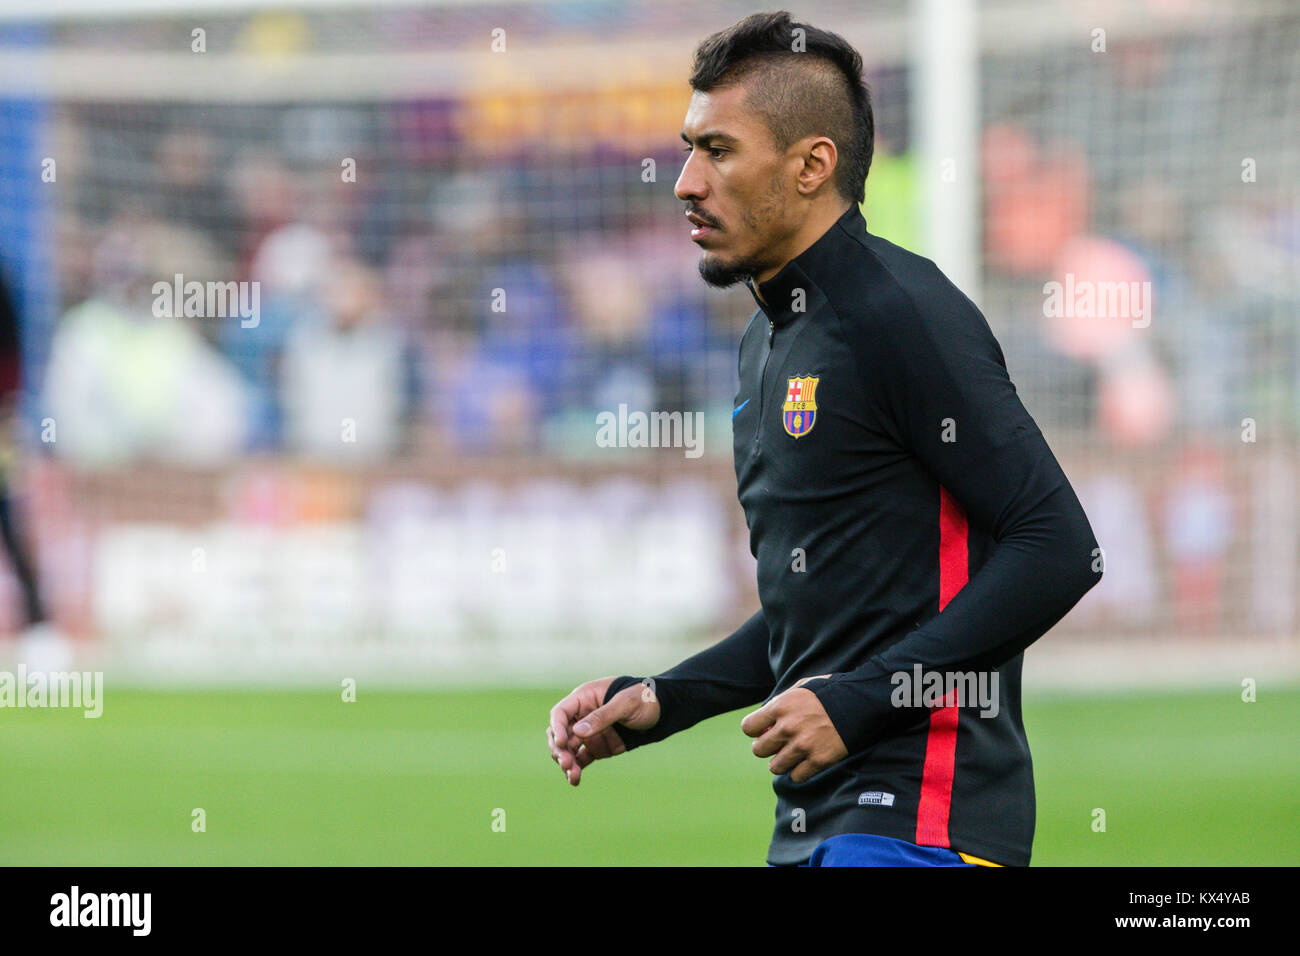 Barcelona, Spain. 07th Jan, 2018. FC Barcelona midfielder Paulinho (15) during the match between FC Barcelona against - Stock Image